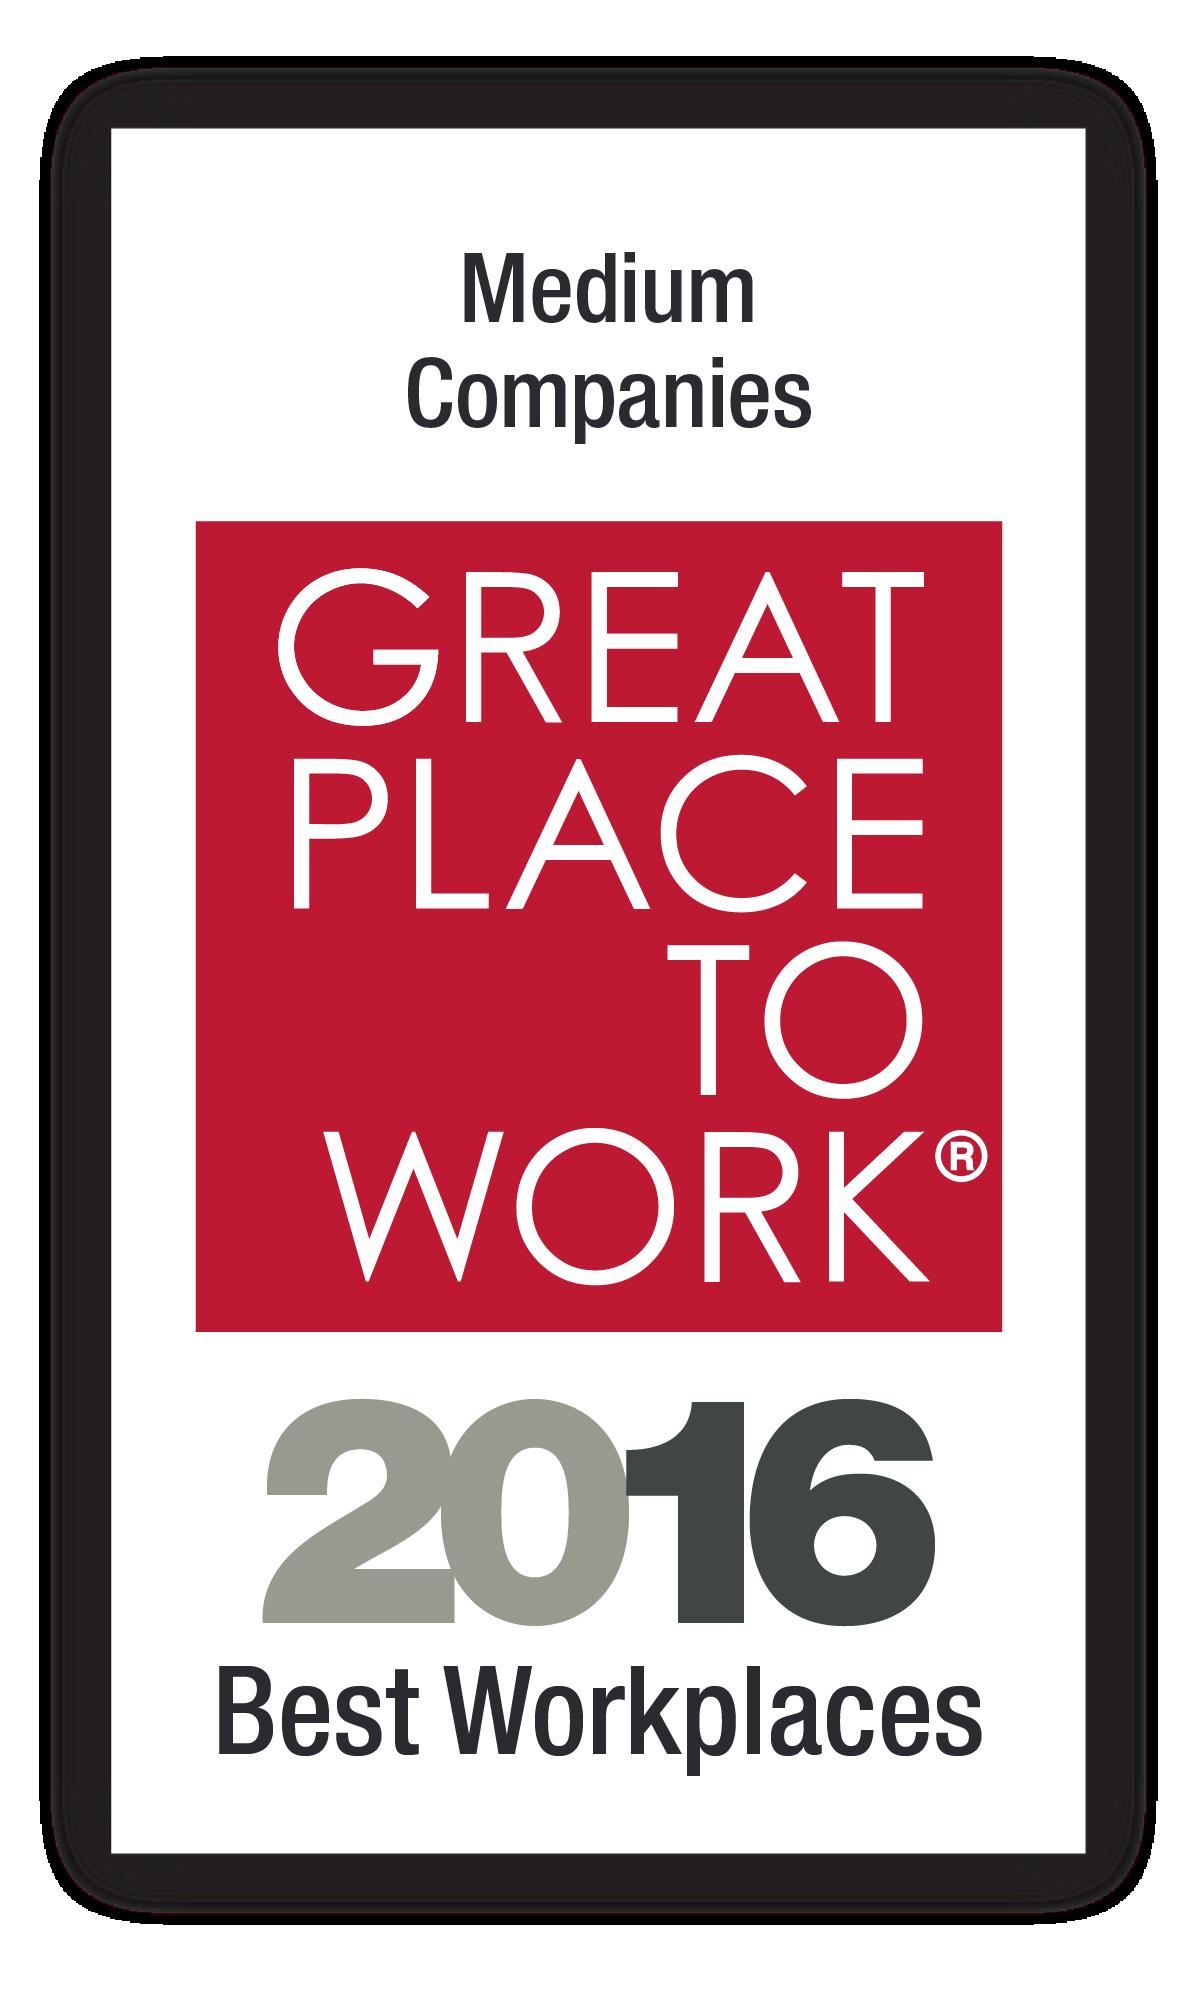 Best Medium Workplaces 2016 Image